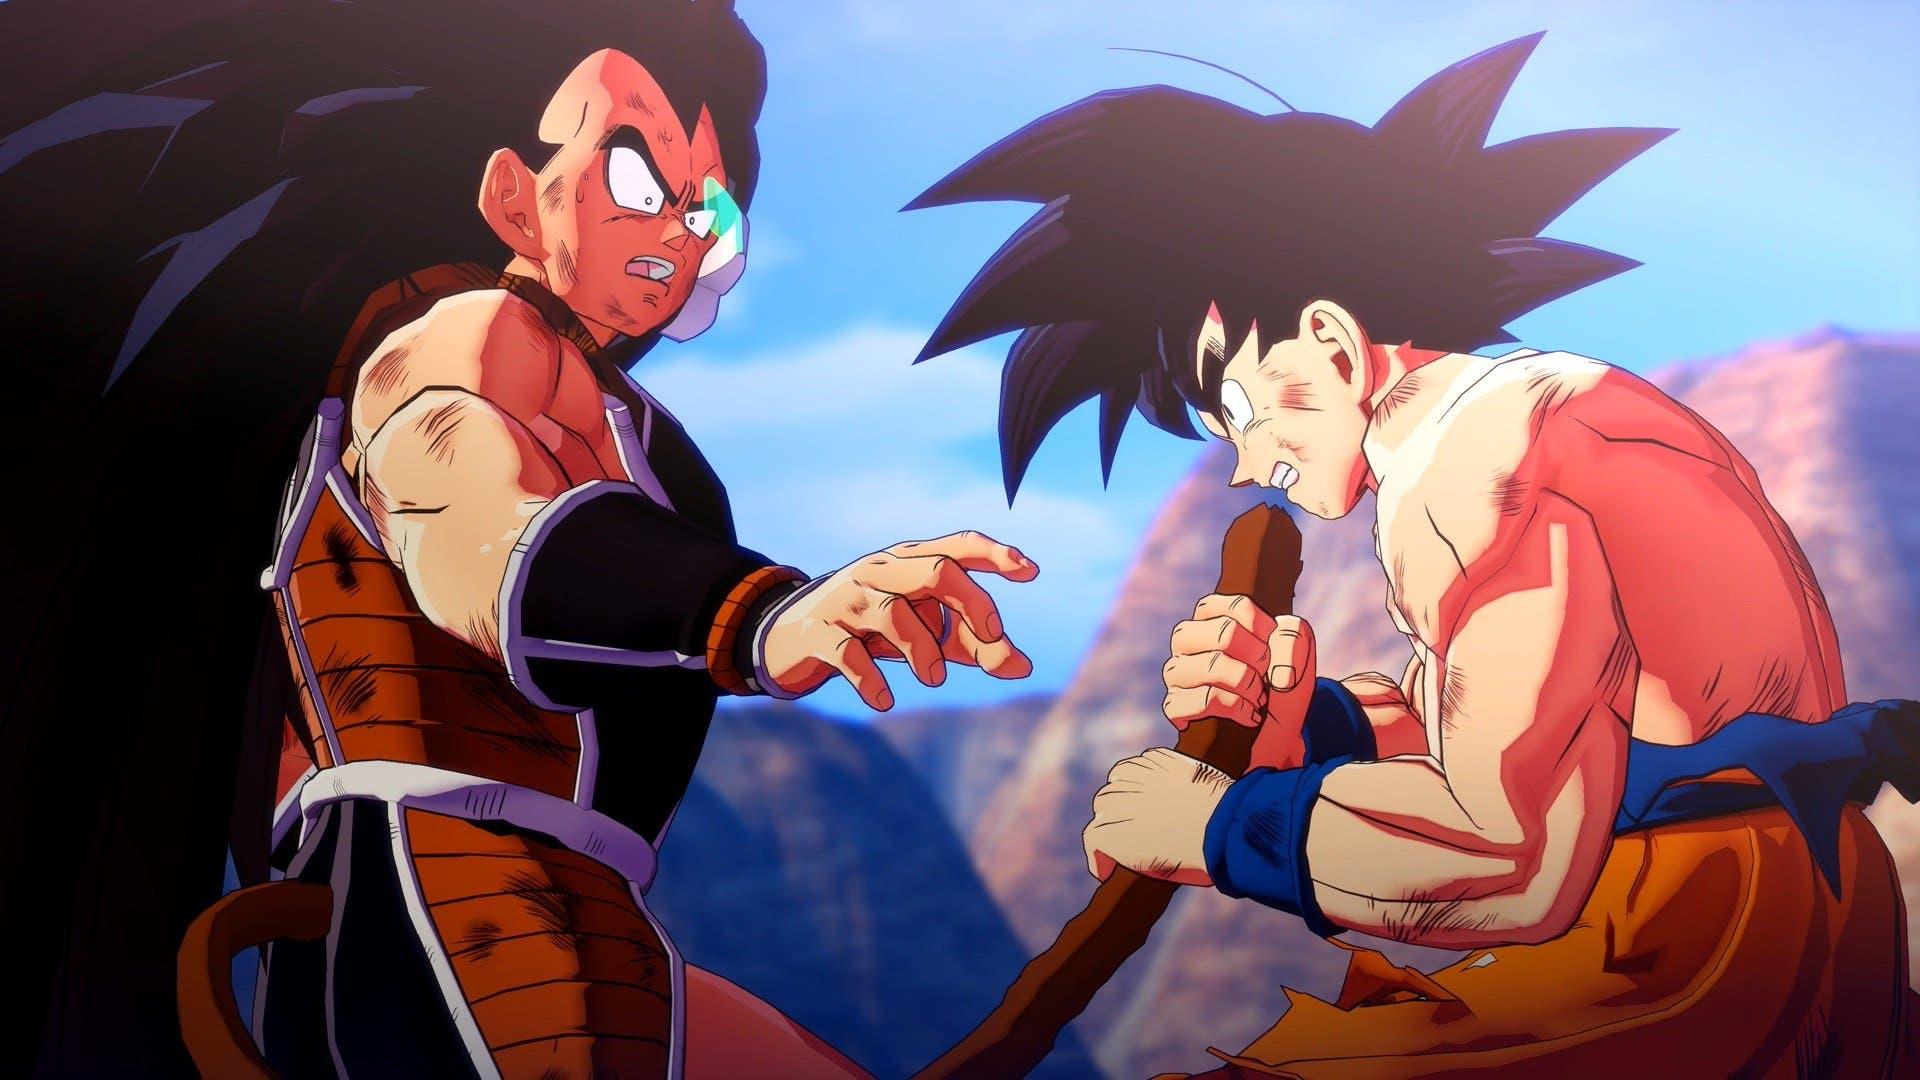 Imagen de Raditz le sirve de sparring a Goku en el nuevo gameplay de Dragon Ball Z Kakarot